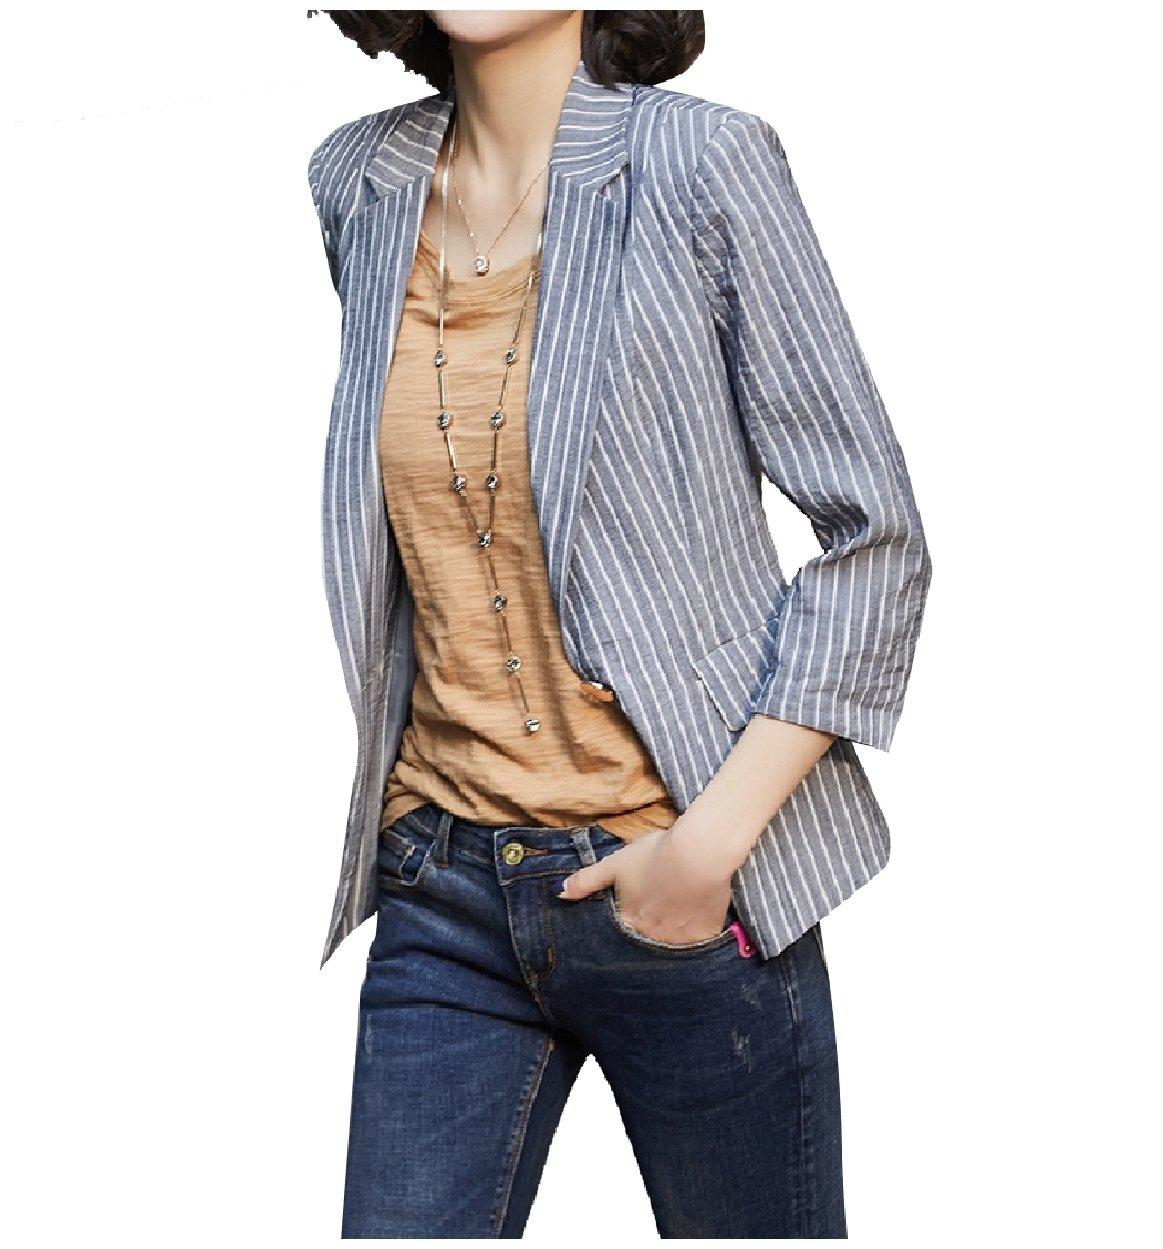 Tootless-Women Retro Stripes Notch Collar Blazer Fine Cotton Suit Coat Blue XL